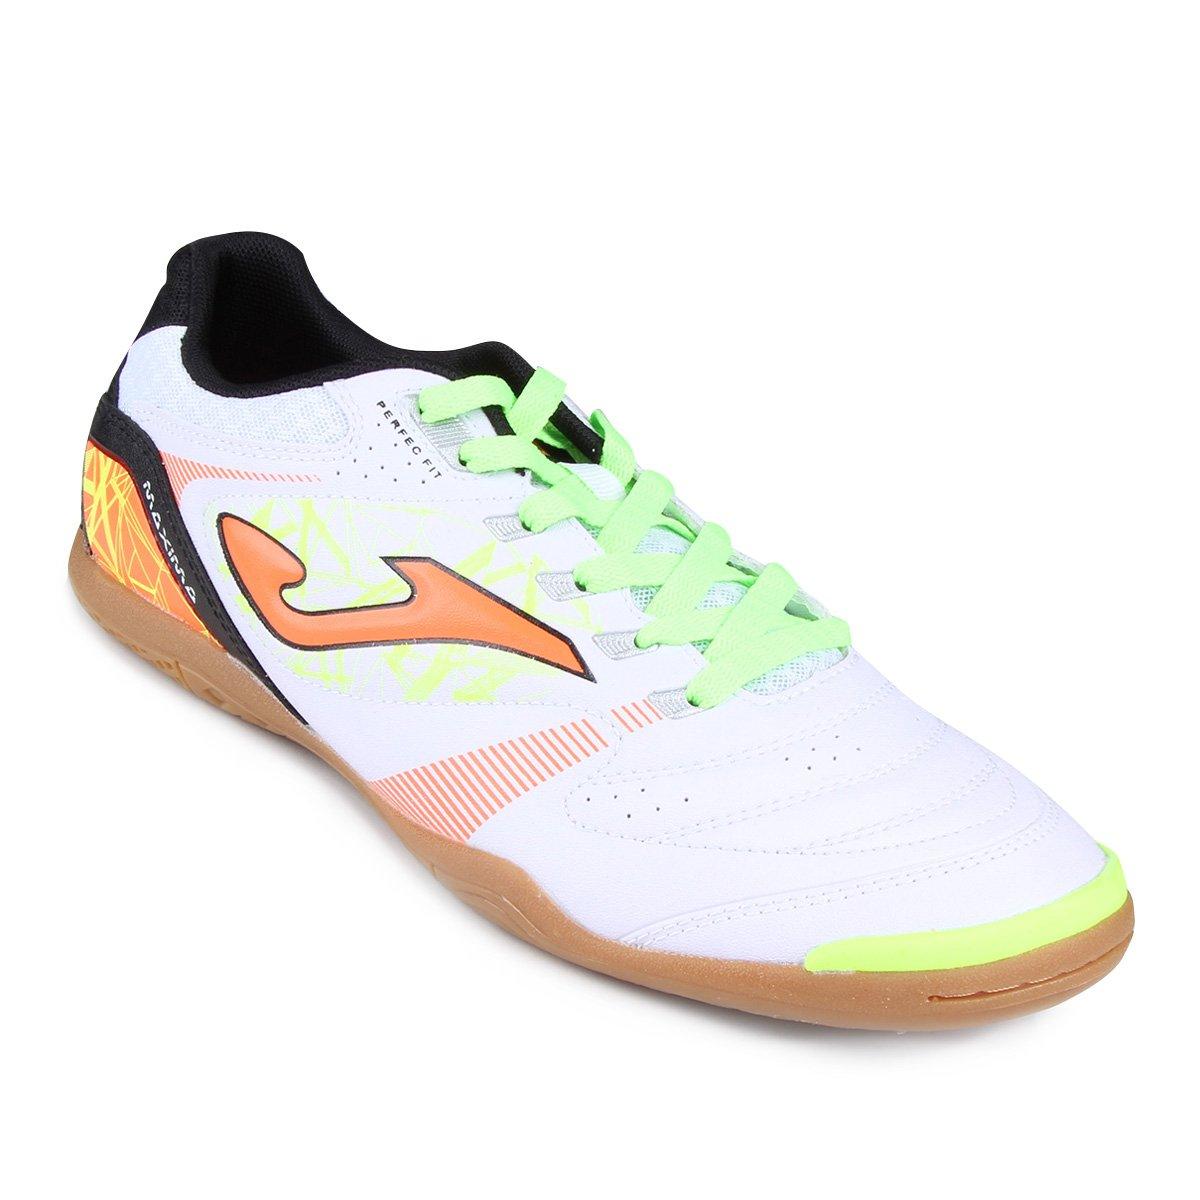 e Futsal Chuteira Masculina Limão Verde Chuteira Máxima Branco Futsal Joma  ExH0BWqCwF ... 3013c6eace552